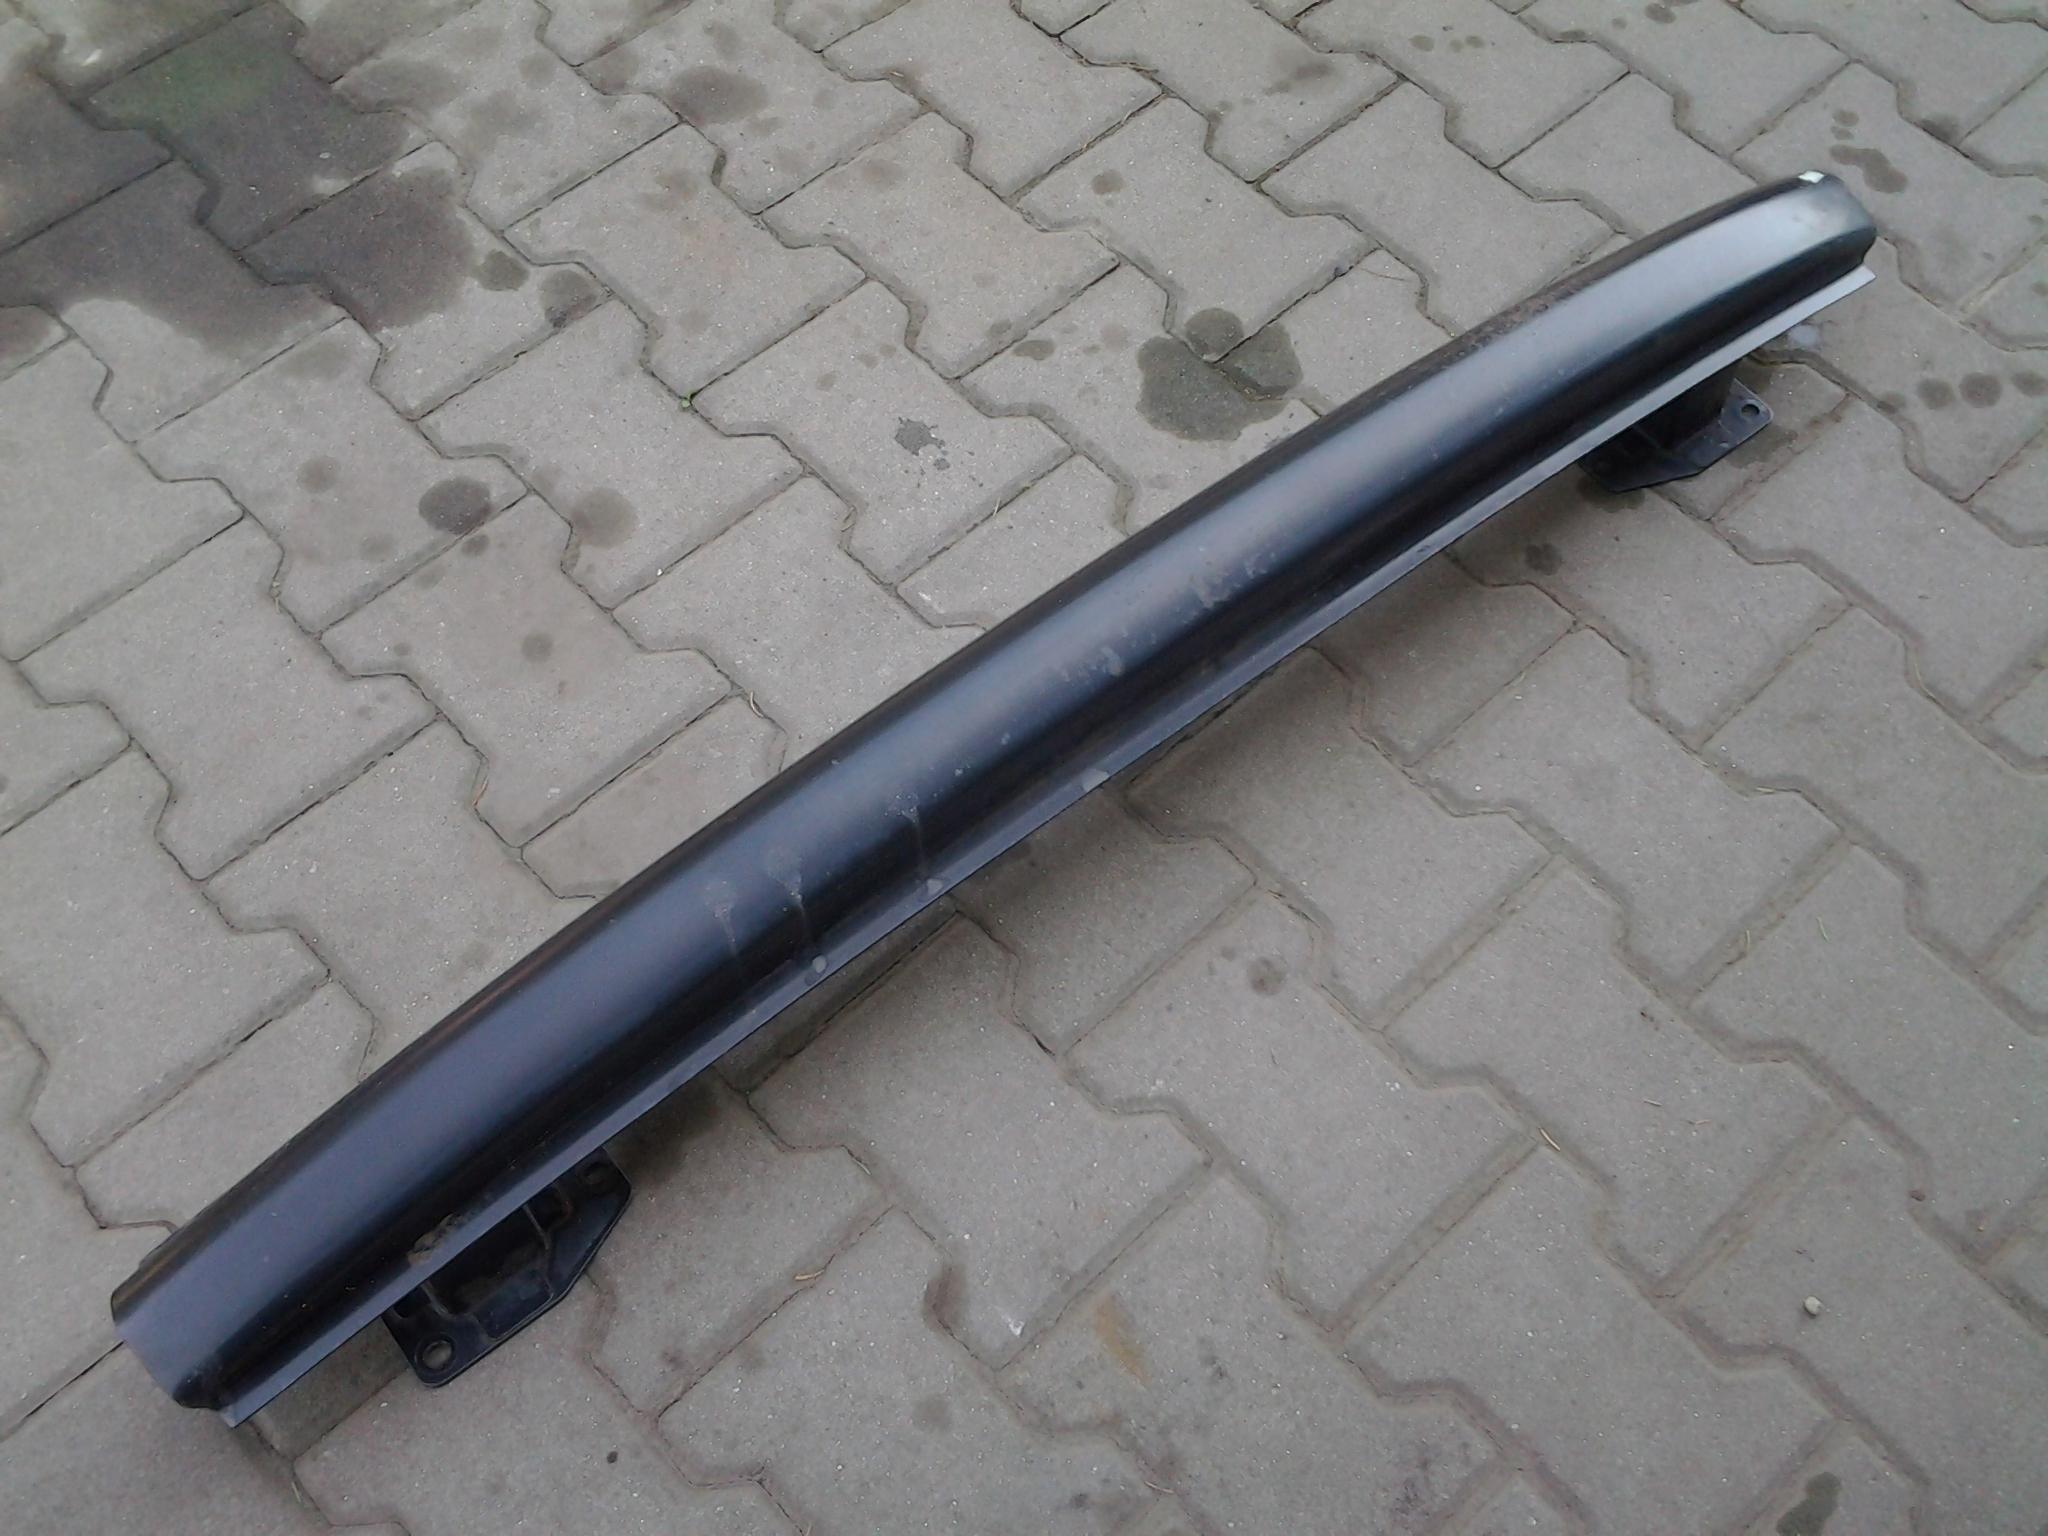 REINFORCEMENT (BEAMS) BUMPER REAR 6L0807487 SEAT IBIZA III